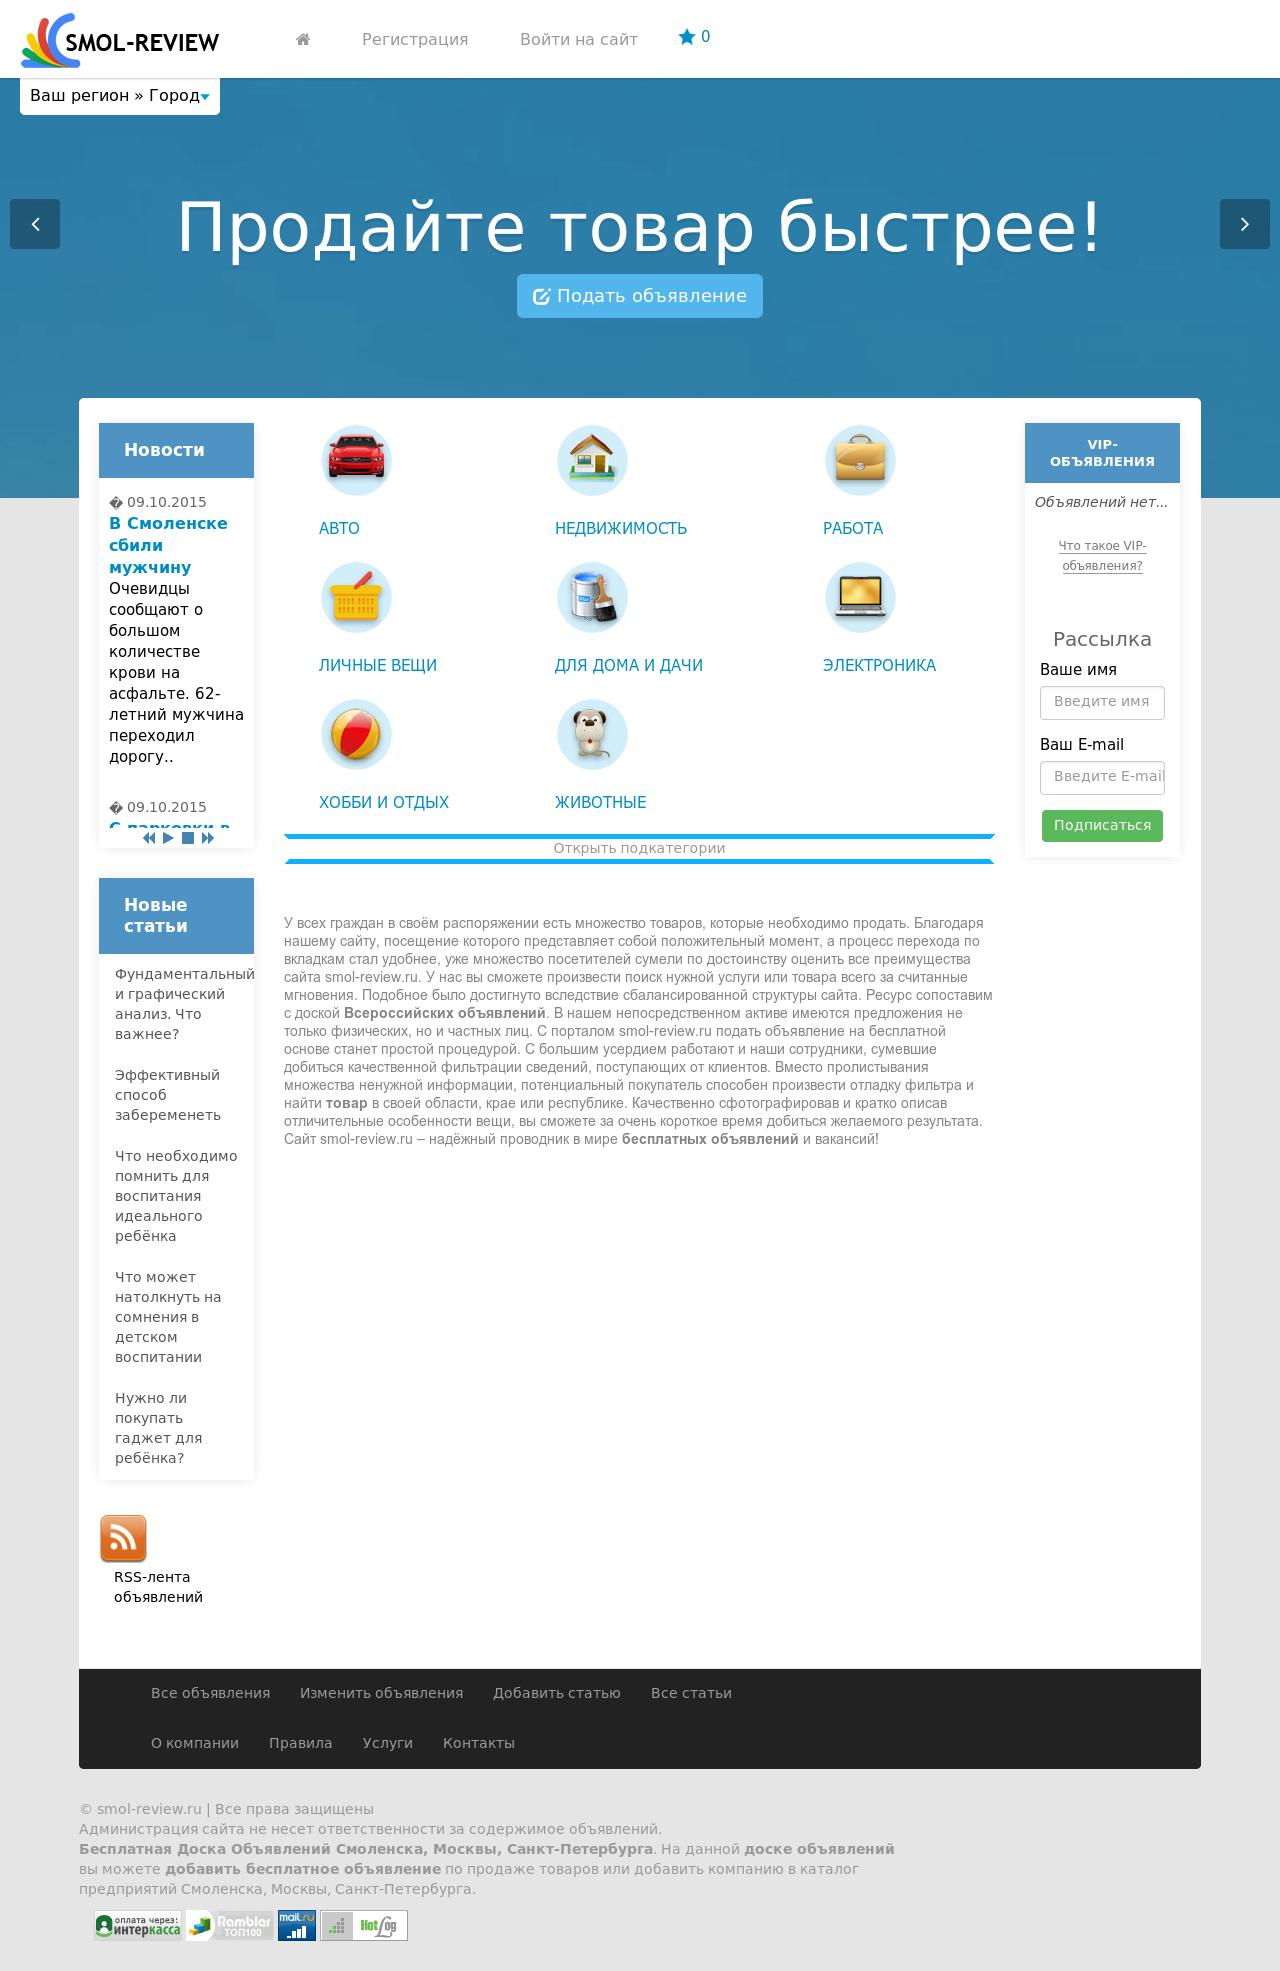 Адаптивный шаблон бесплатно - Boxcode 10.1 — Make-Board.ru ... 5b2ad6411ee